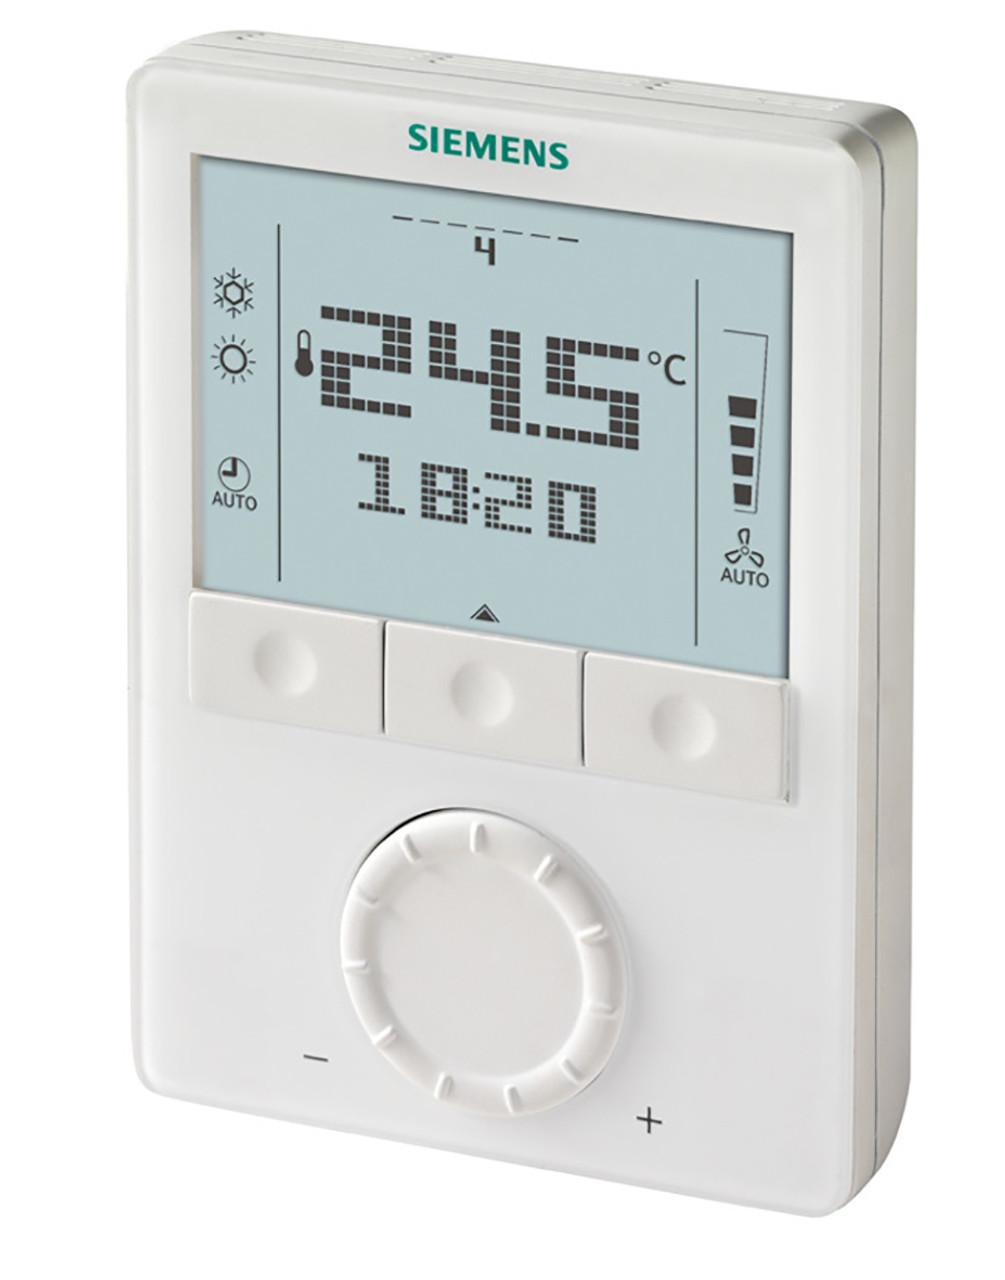 Siemens RDG160T, S55770-T343 Room thermostat